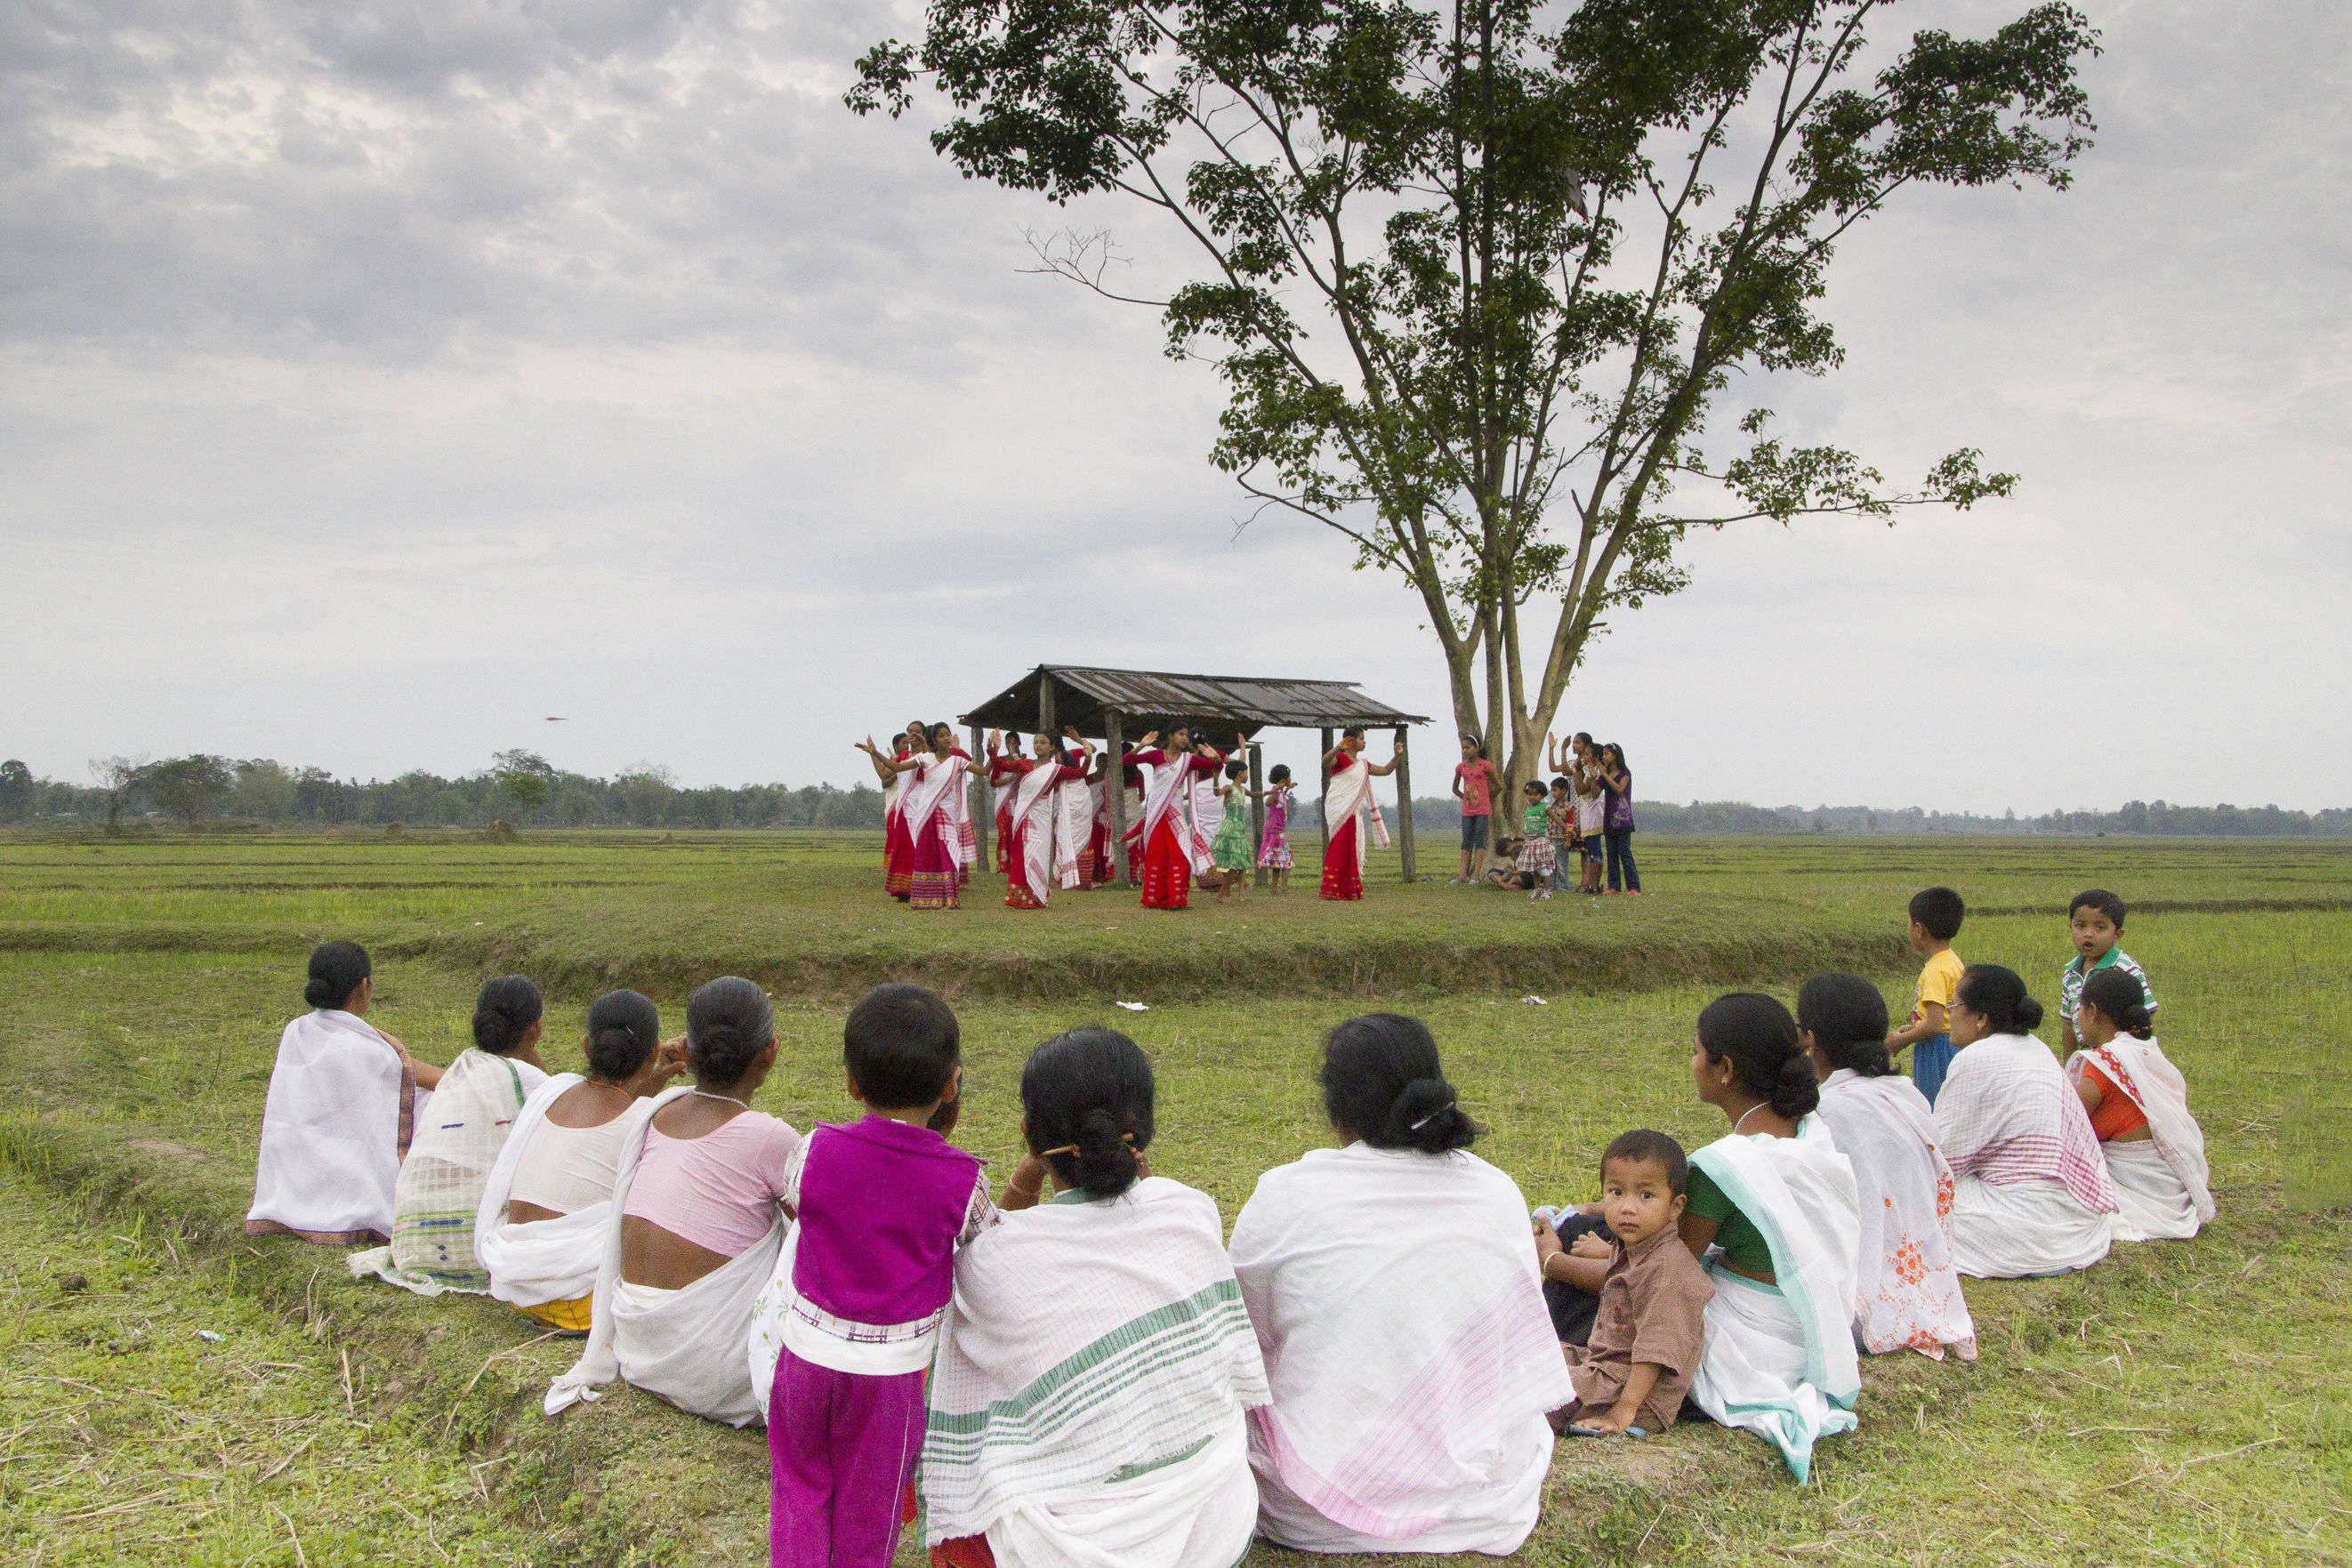 Rongali Bihu 2019—visit Assam to witness a cultural festival